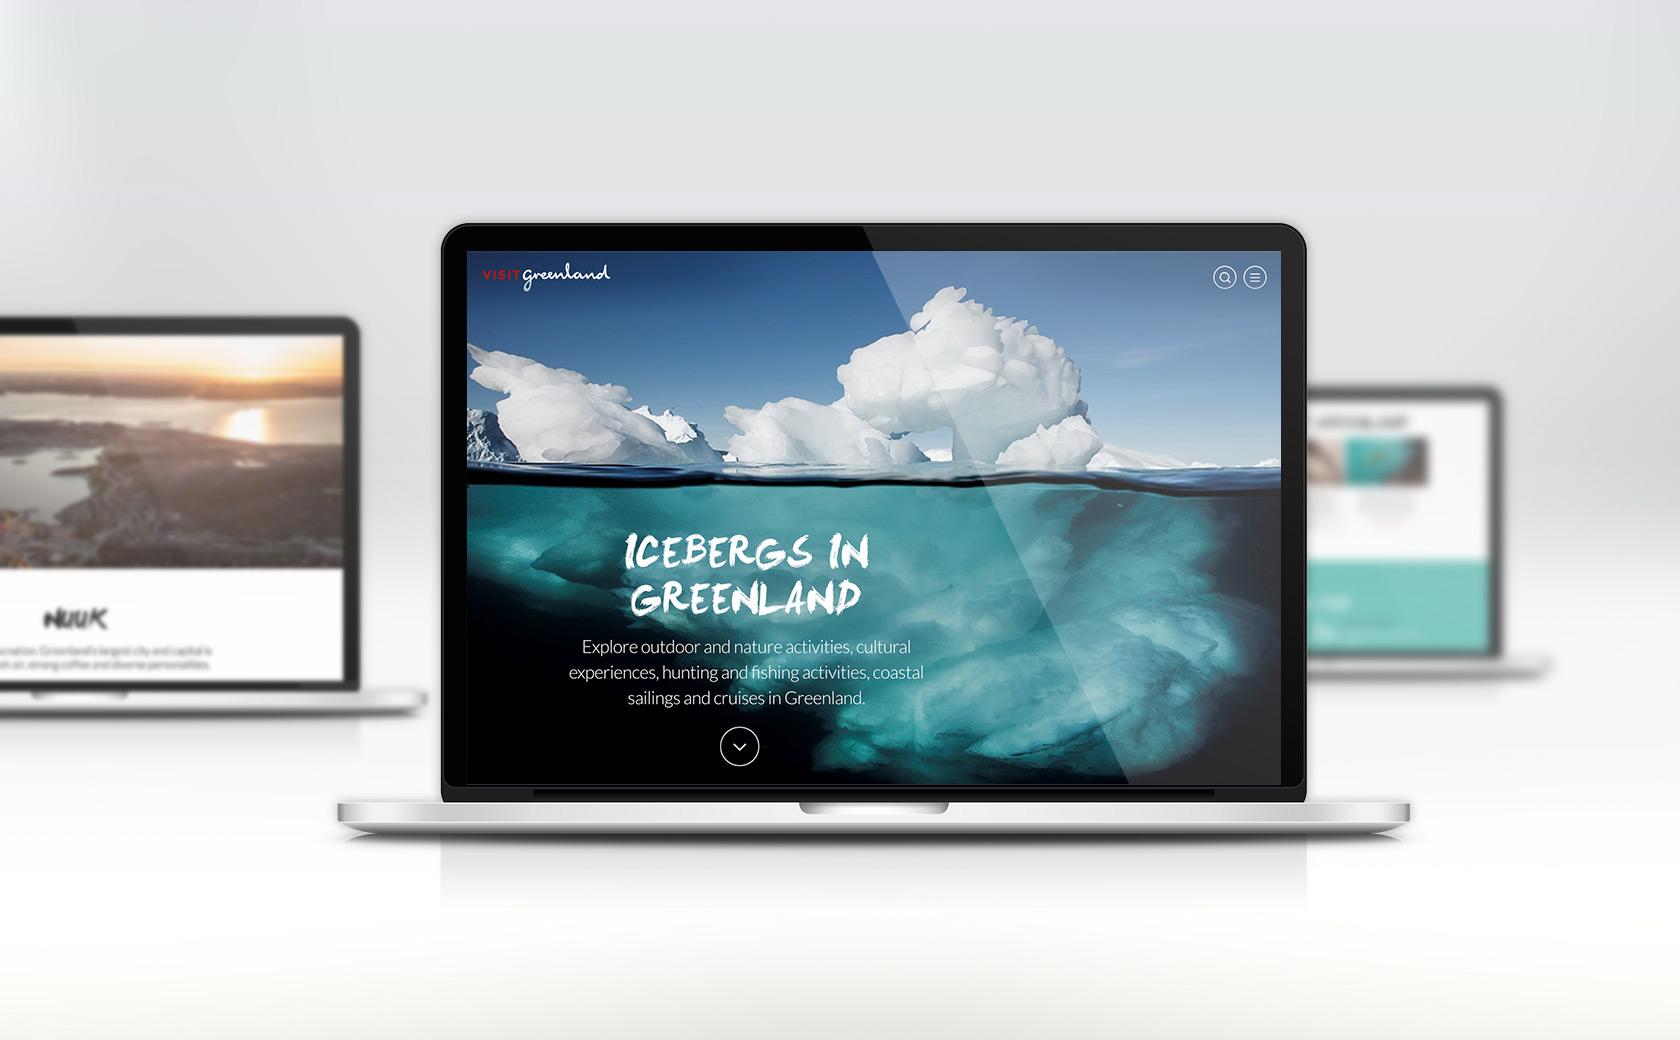 Visit Greenland website